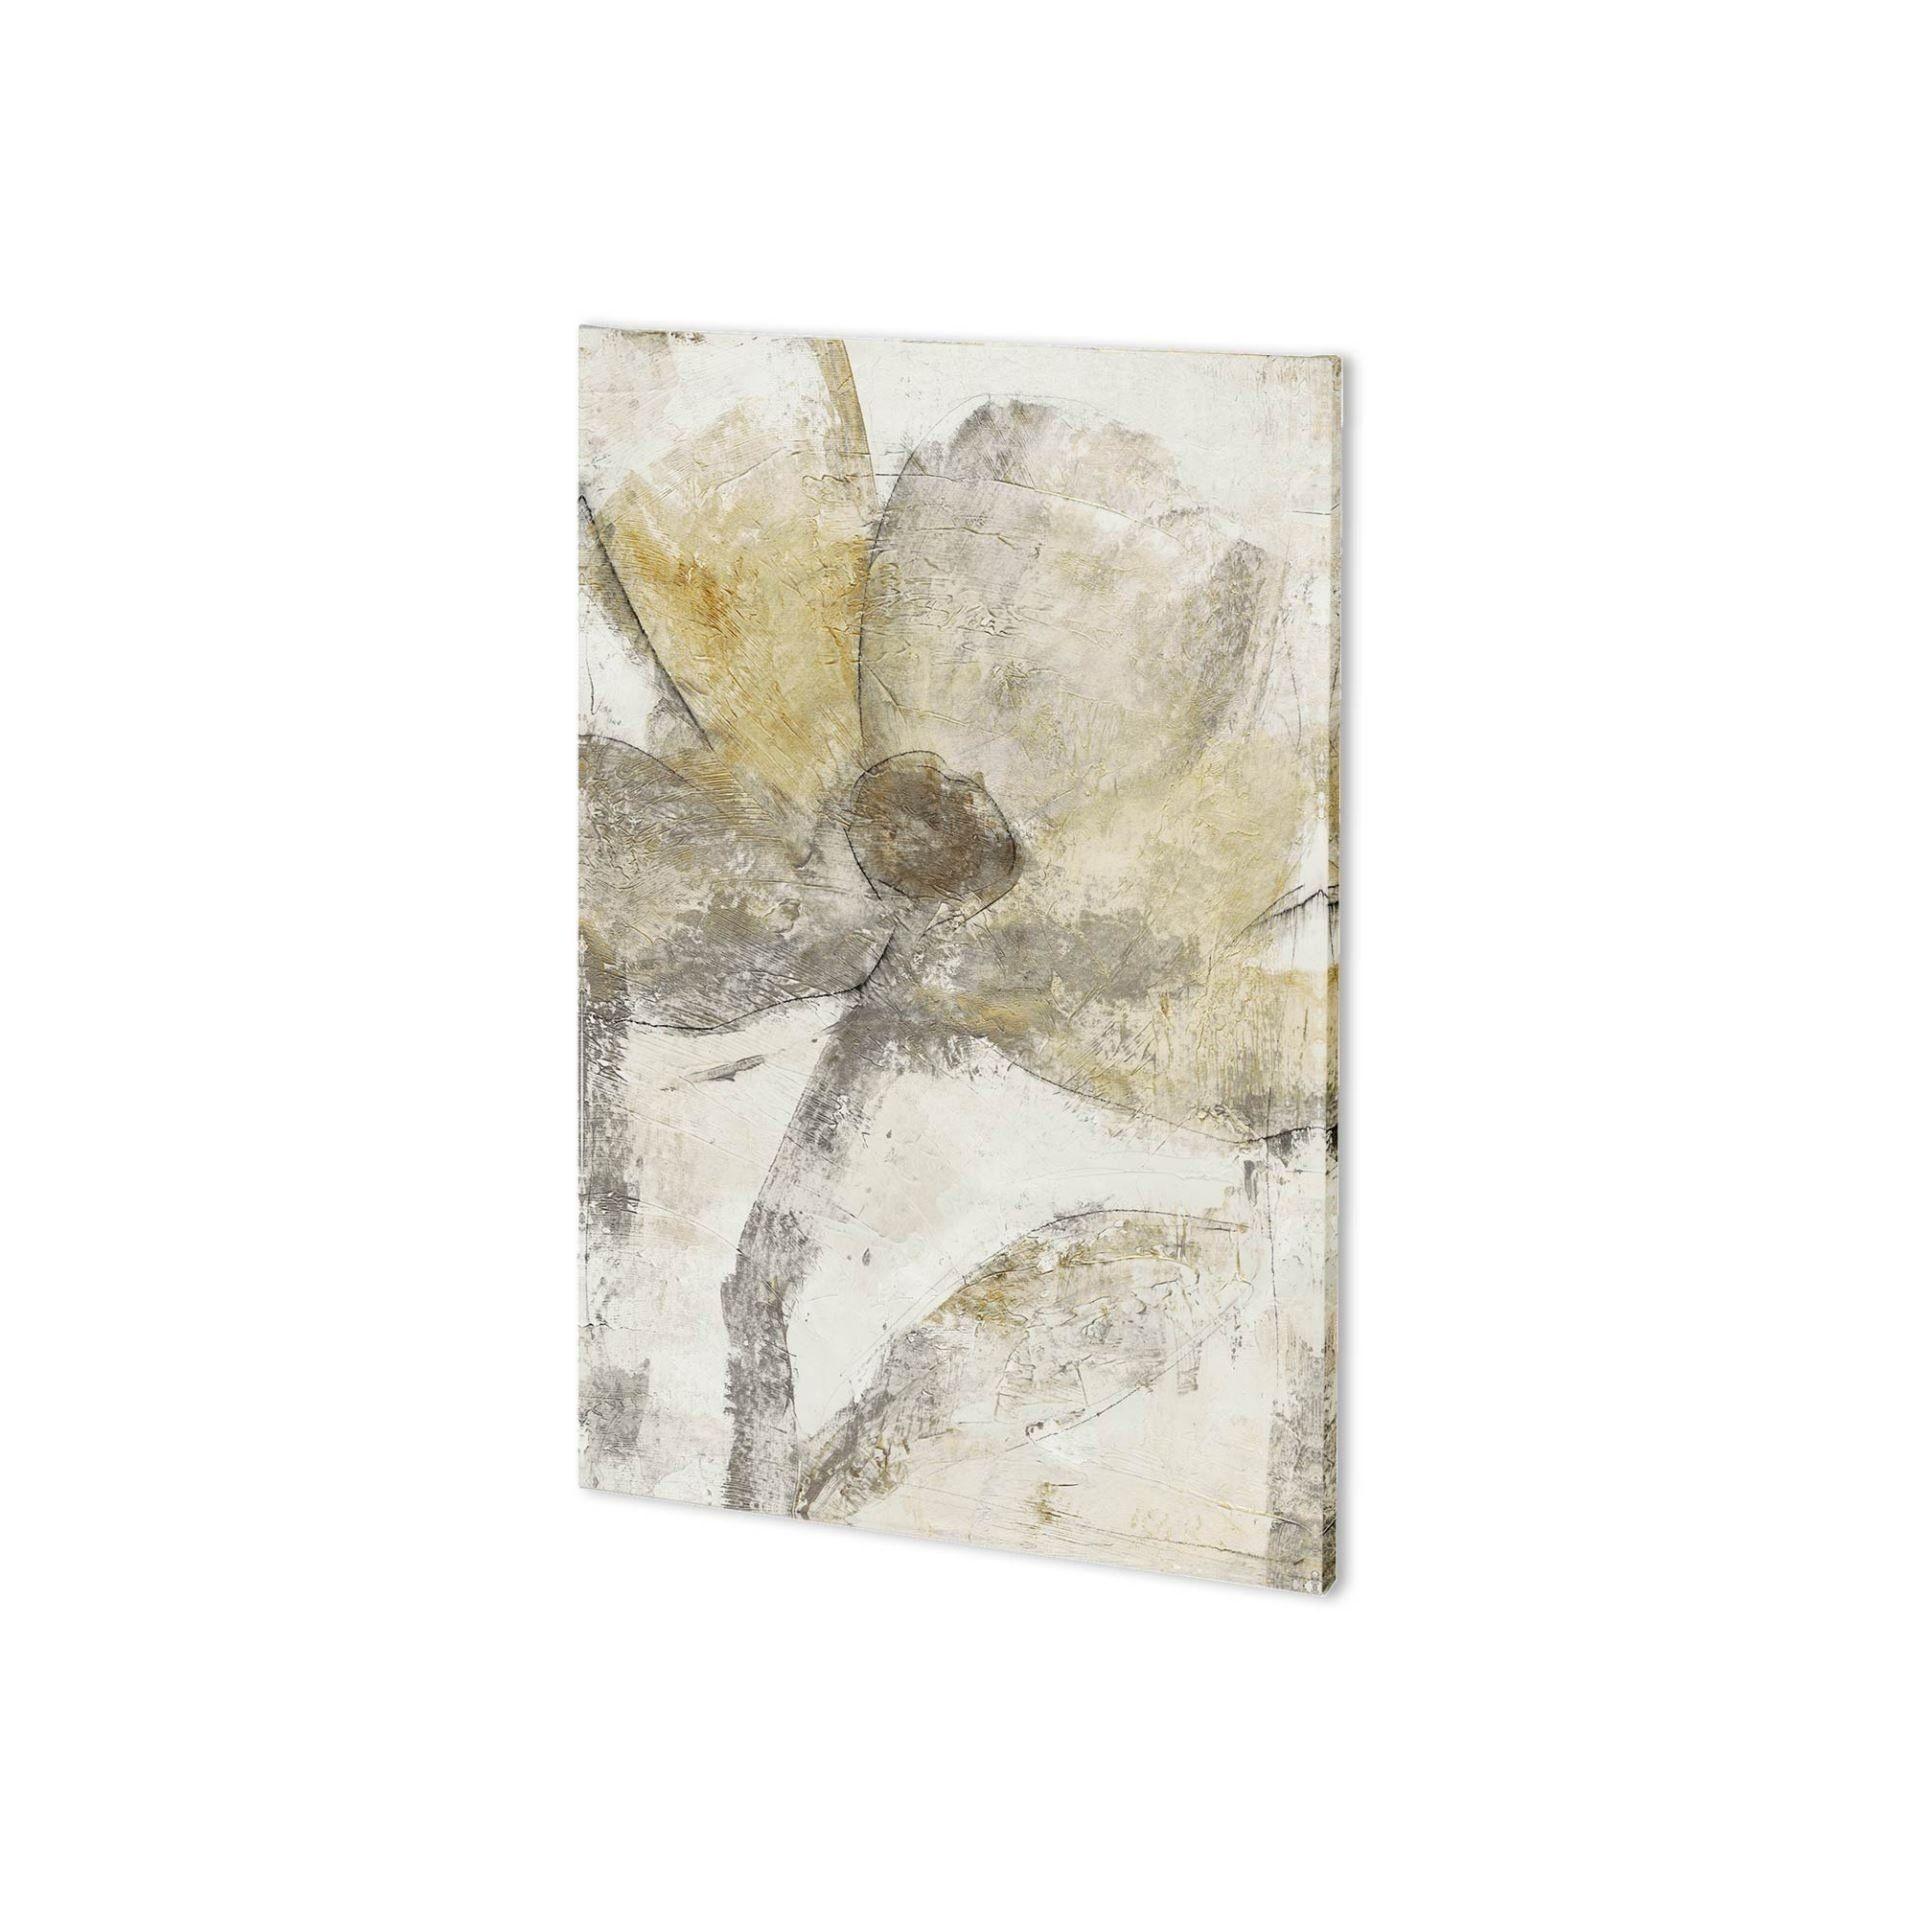 Mercana Une Fleur II (26 x 38) Made to Order Canvas Art, White